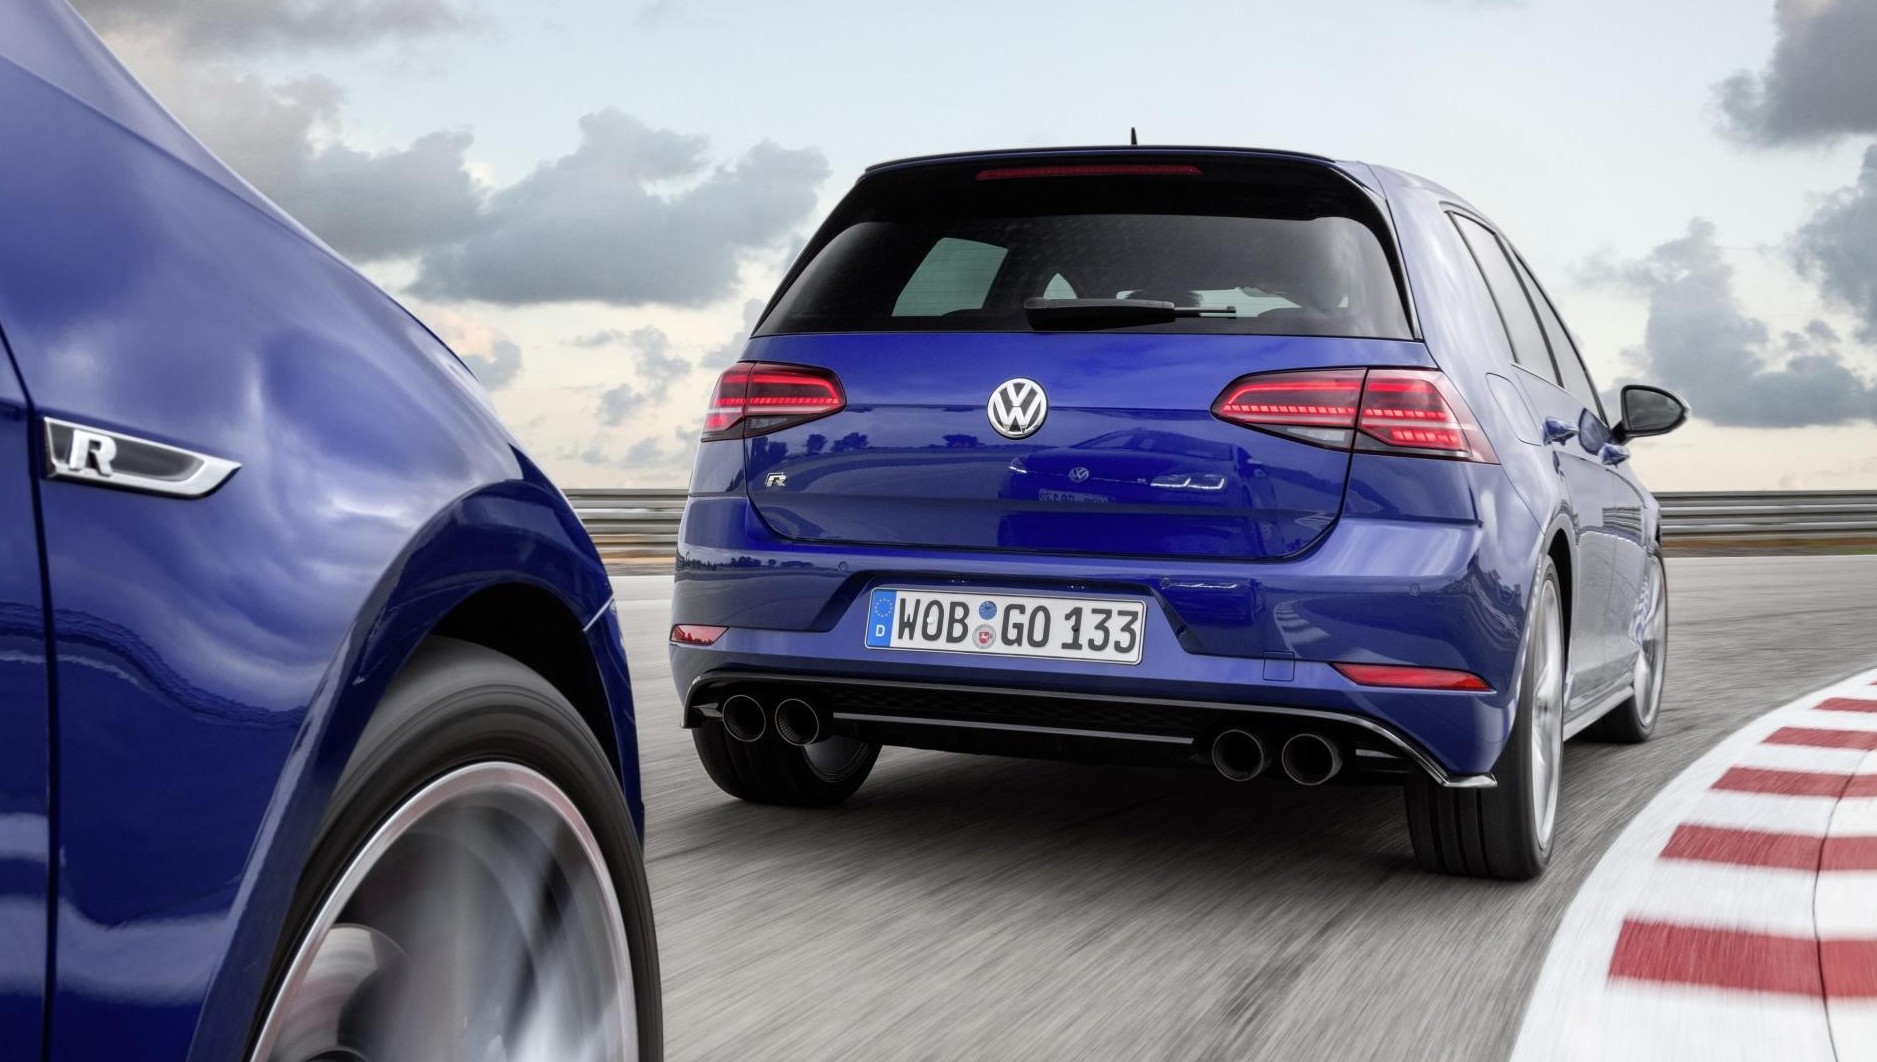 Volkswagen Golf 7 2019 conviene comprare